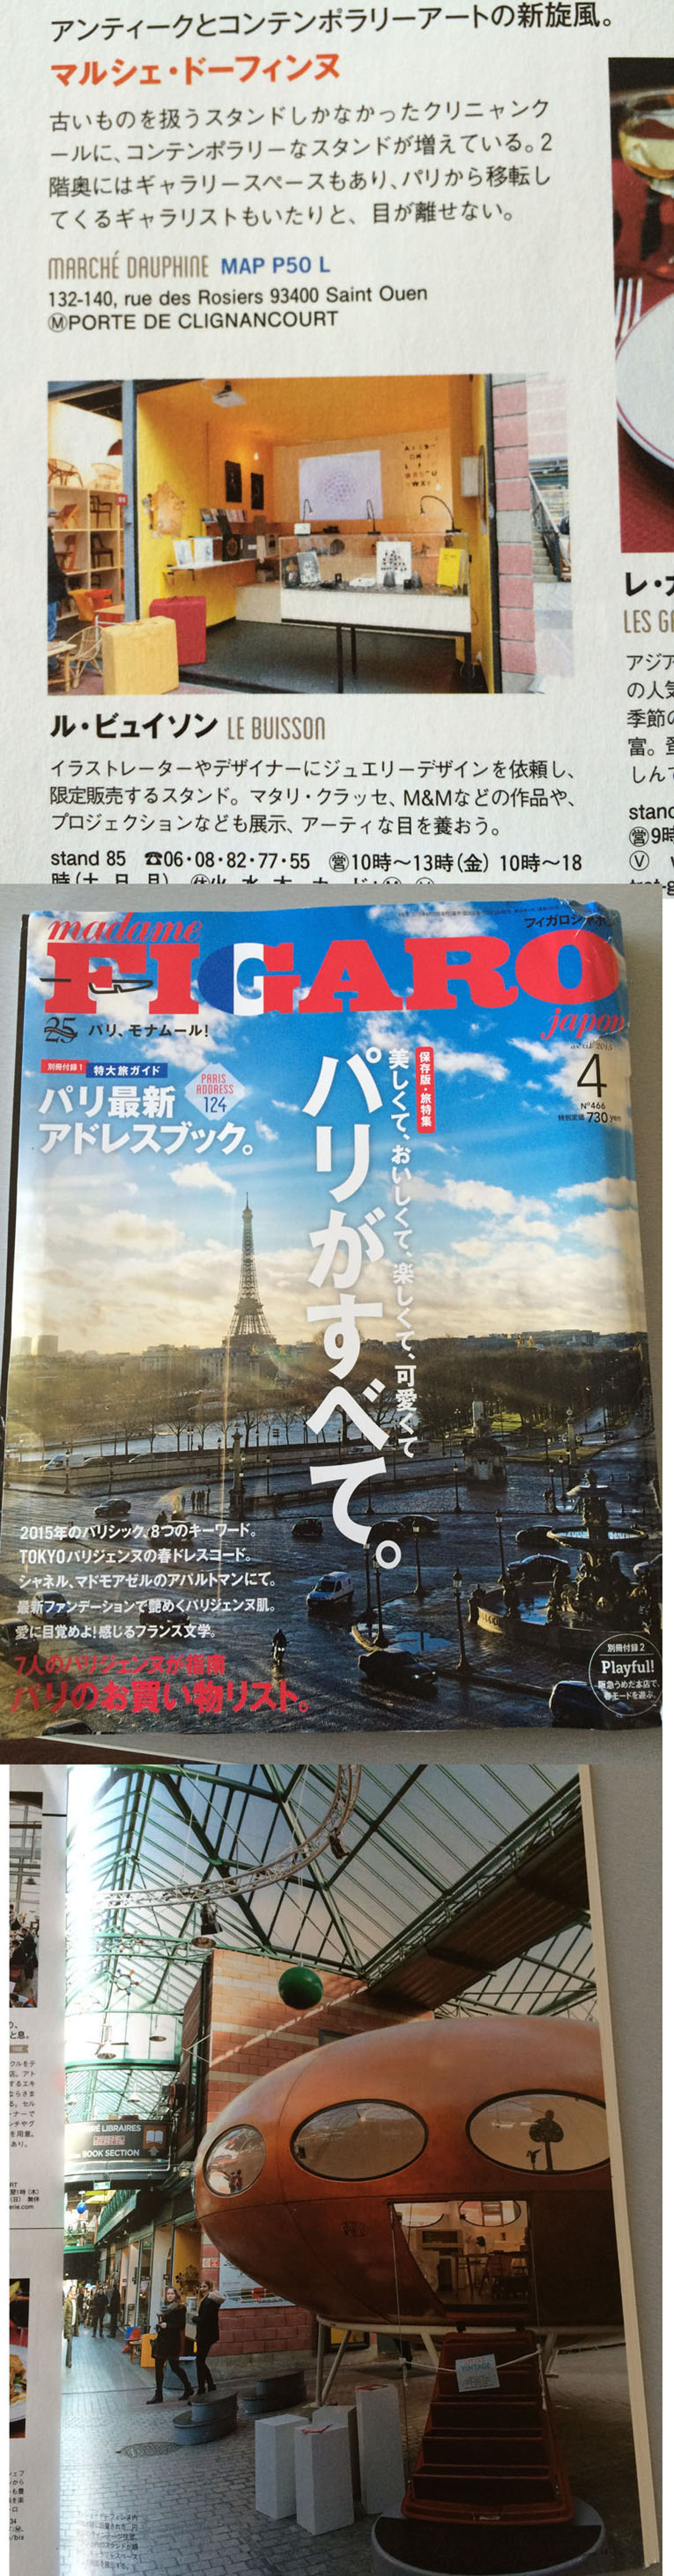 Figaro_Japon.jpg